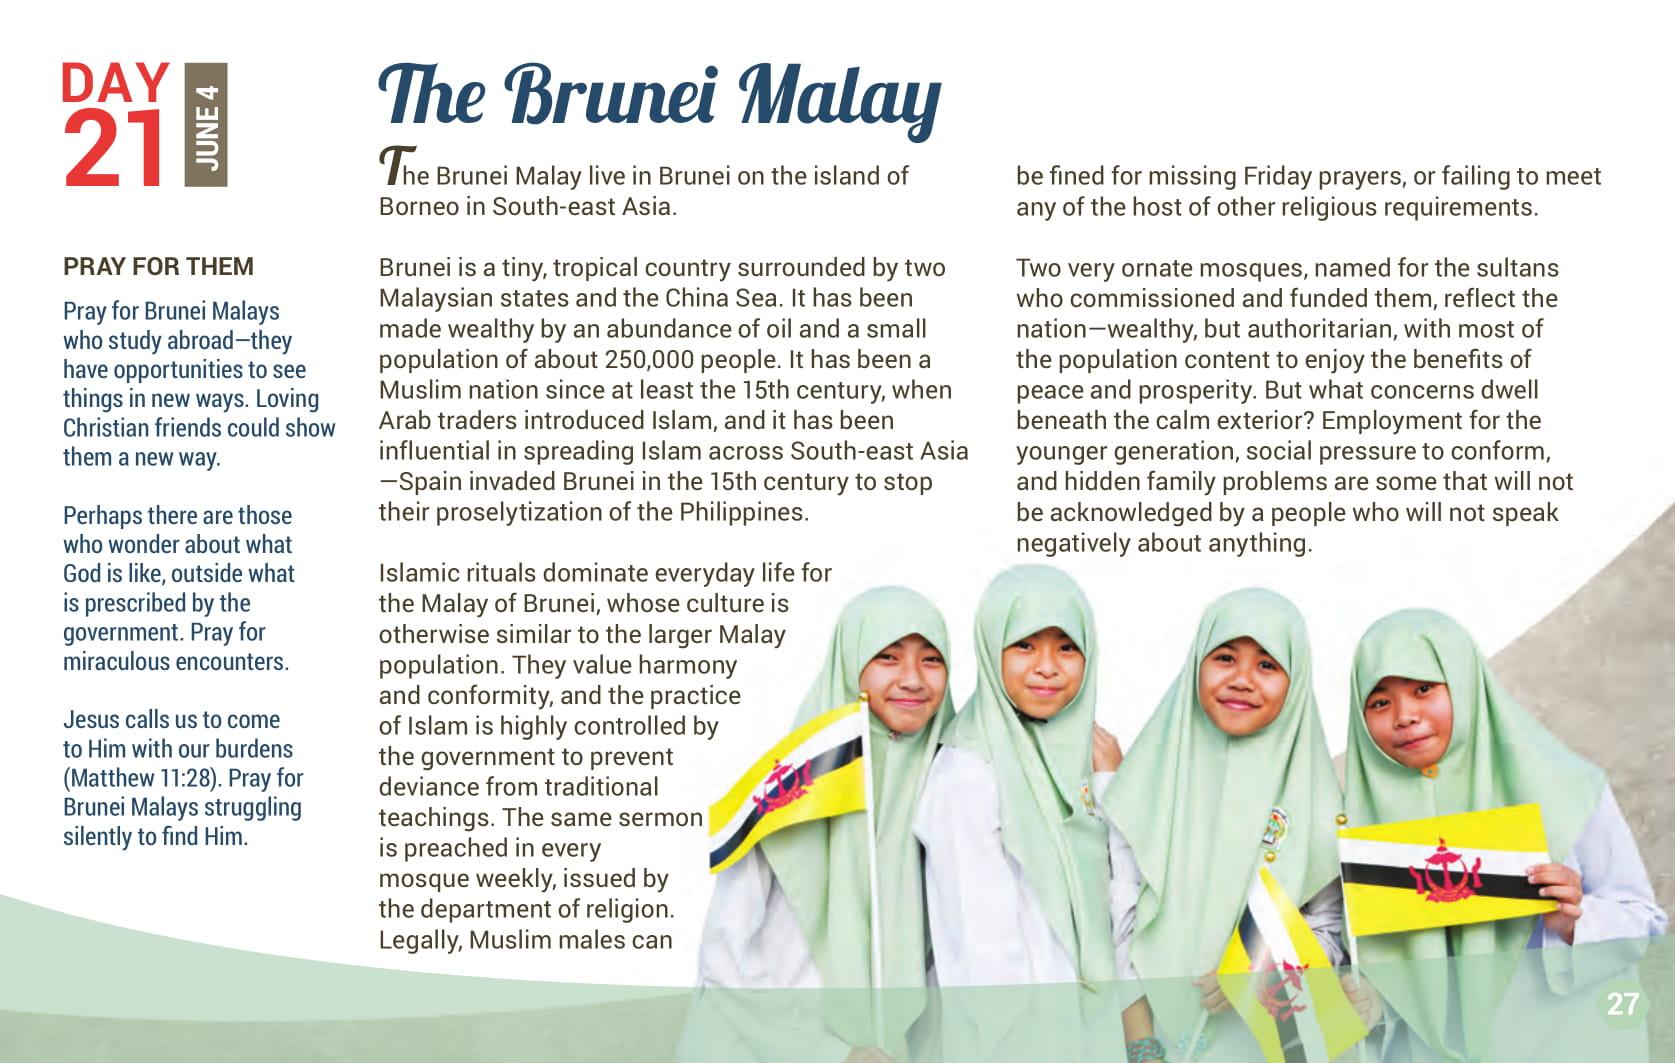 Day 21 - The Brunei Malay